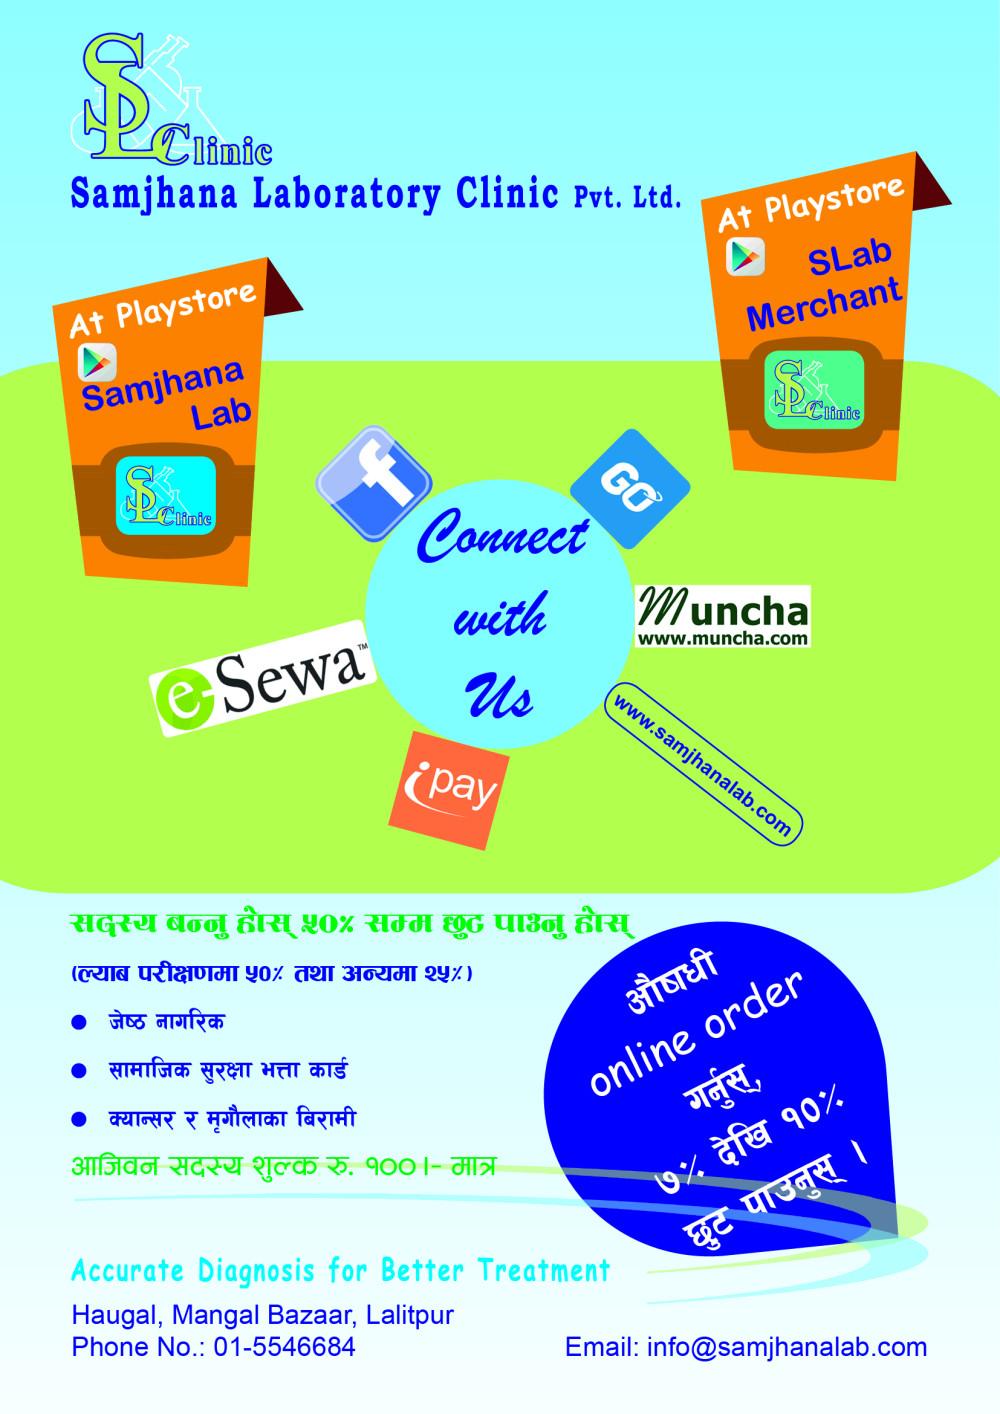 Samjhana Laboratory Clinic Pvt. Ltd.